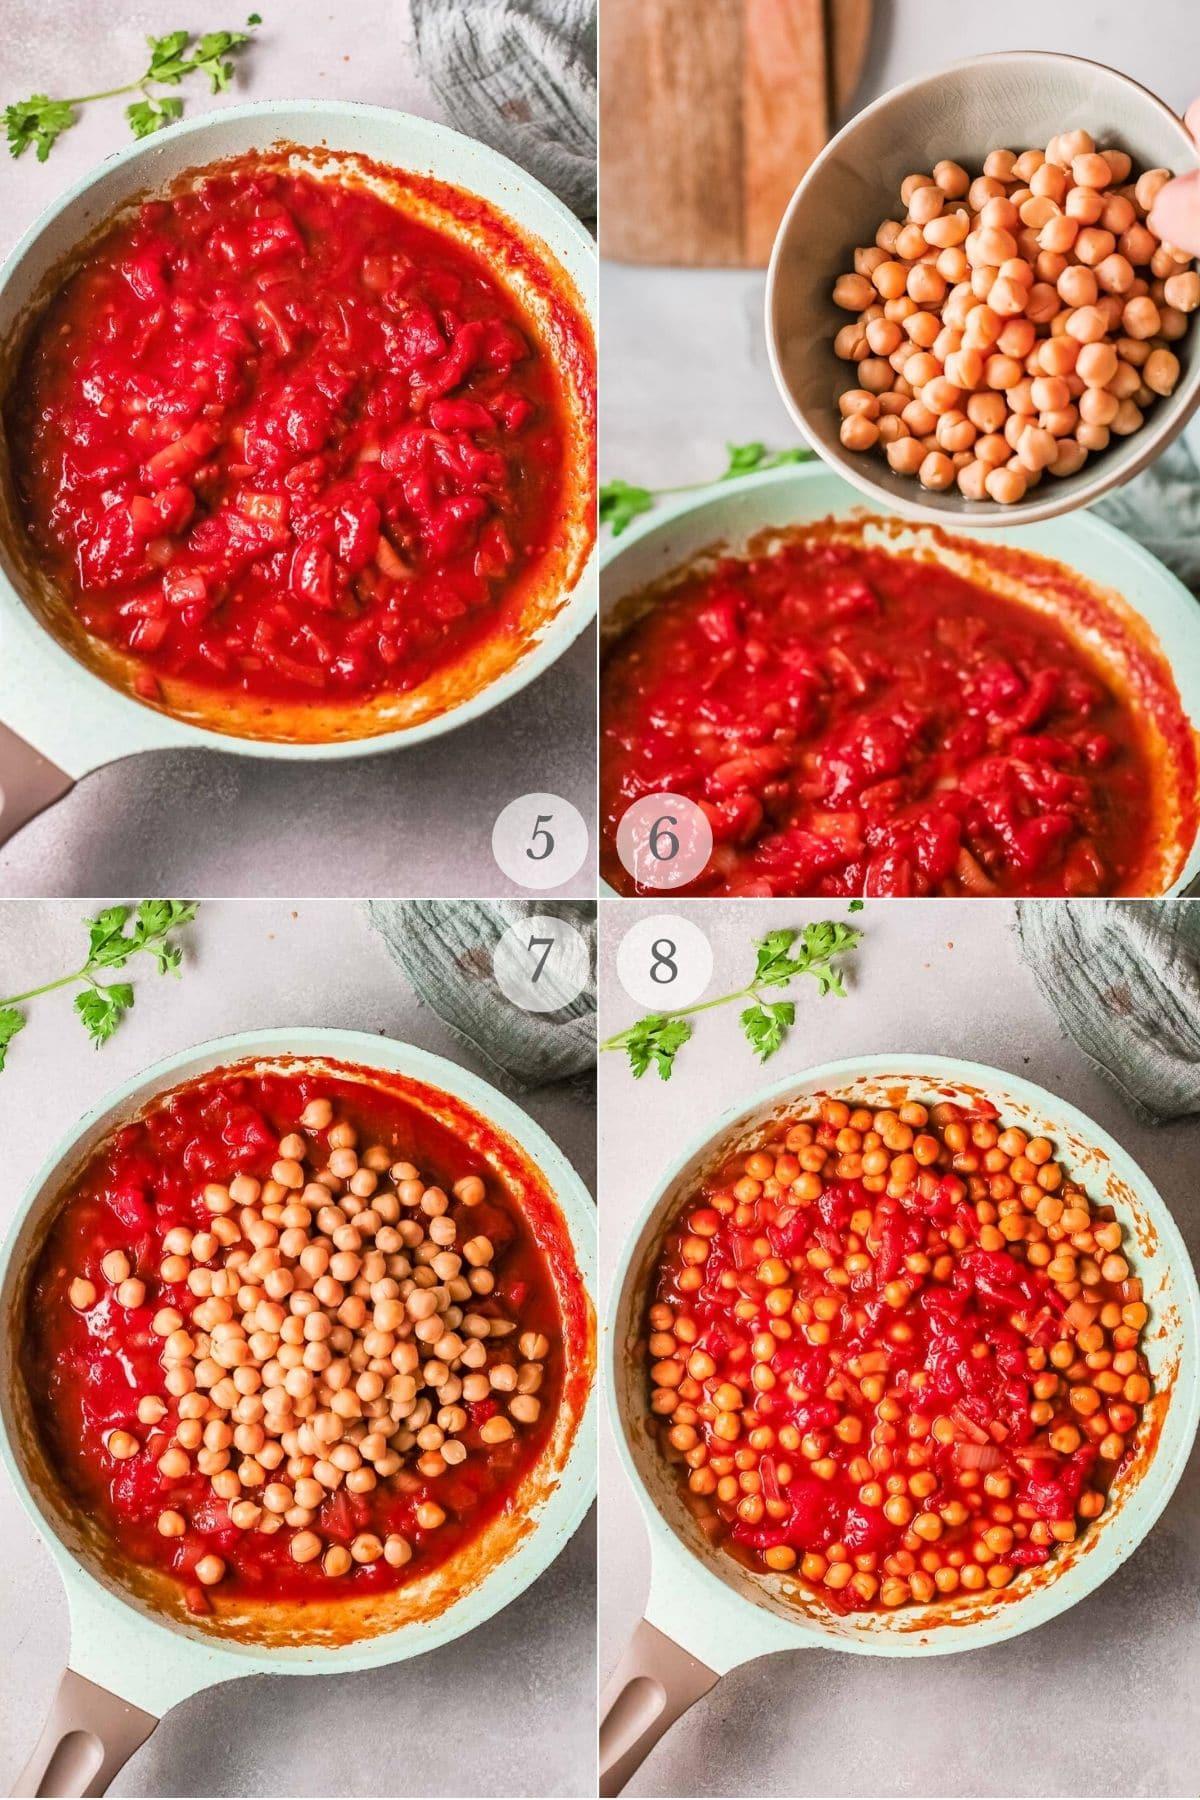 chana masala recipe steps 5-8